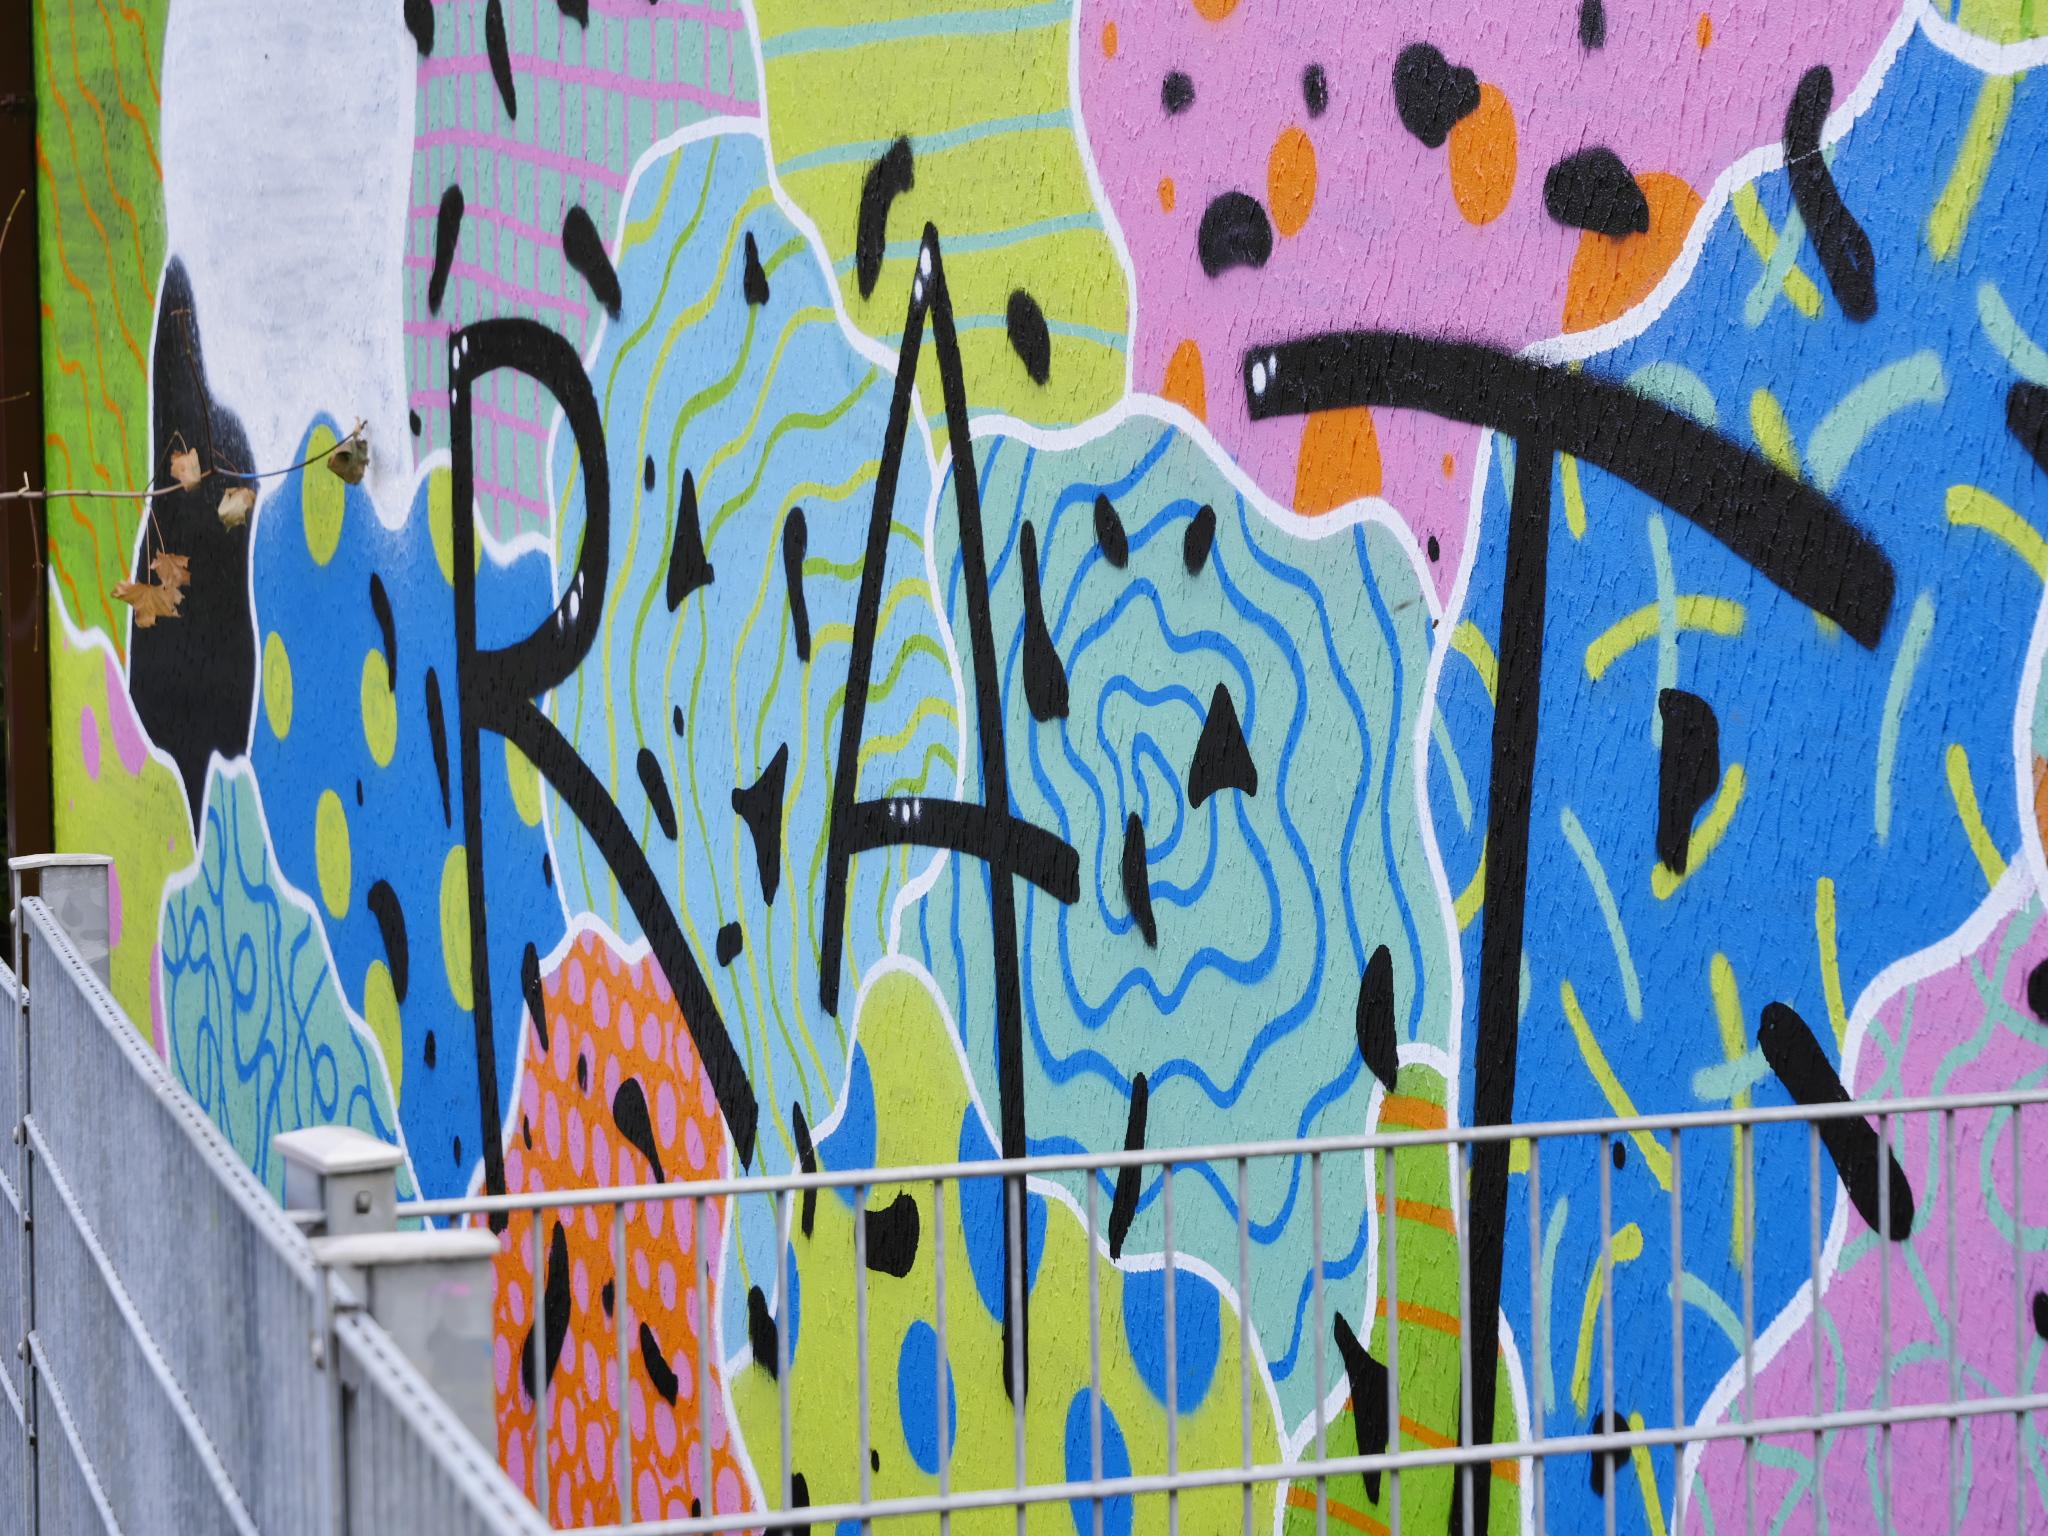 jugendkulturjahr-2020-ratingen-jkj2020-graffiti-trafohaeuschen-stadtwerke-Bild09